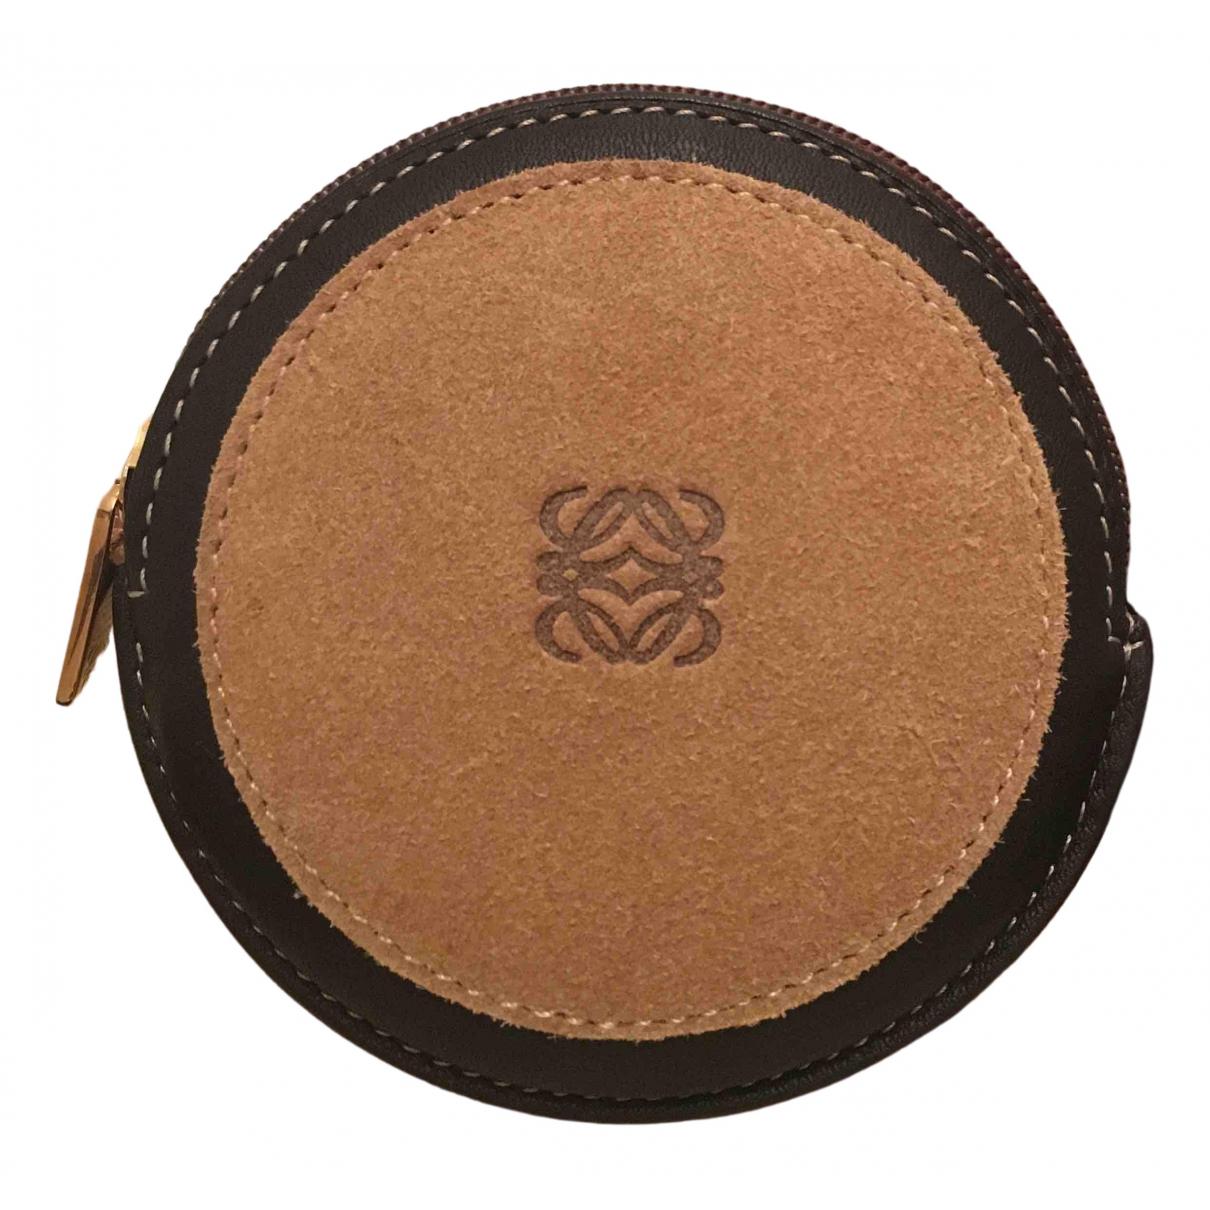 Loewe - Petite maroquinerie   pour femme en cuir - marron